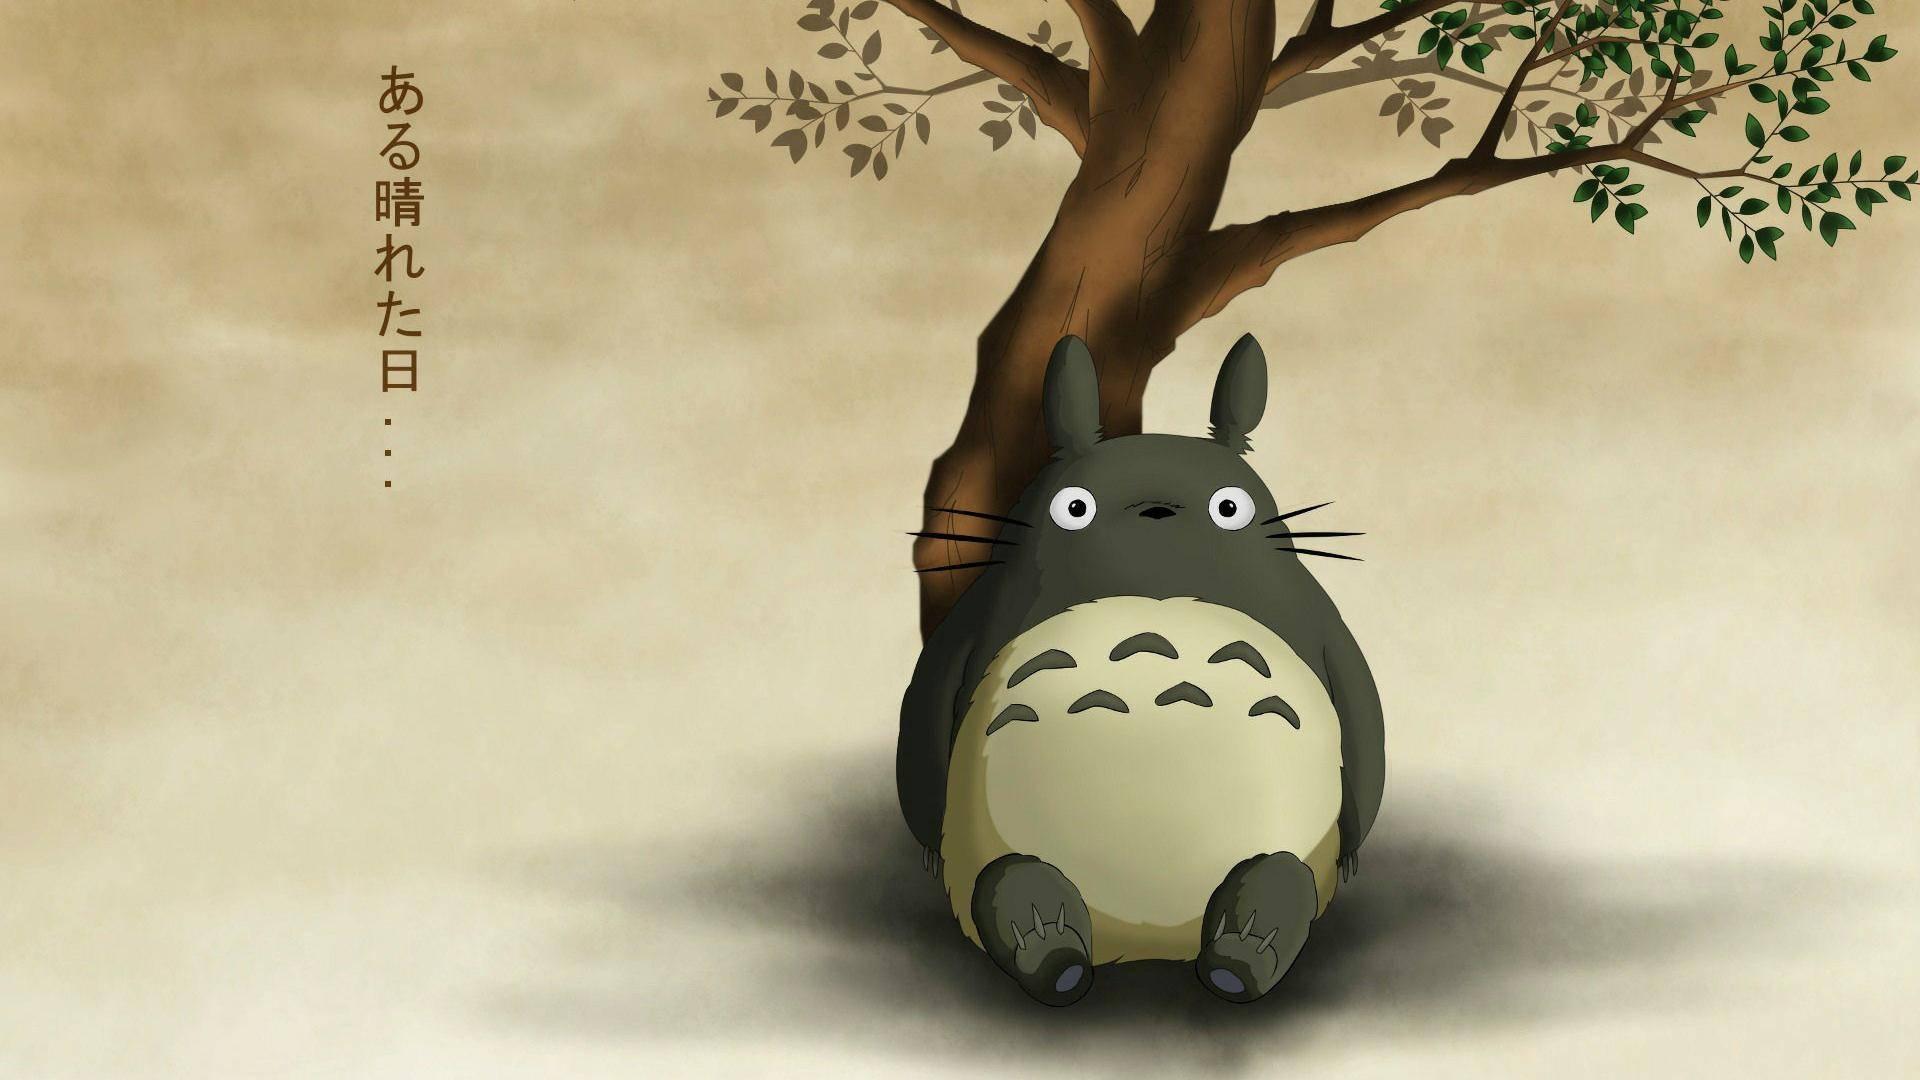 My Neighbor Totoro   Studio Ghibli Wallpaper 1920x1080